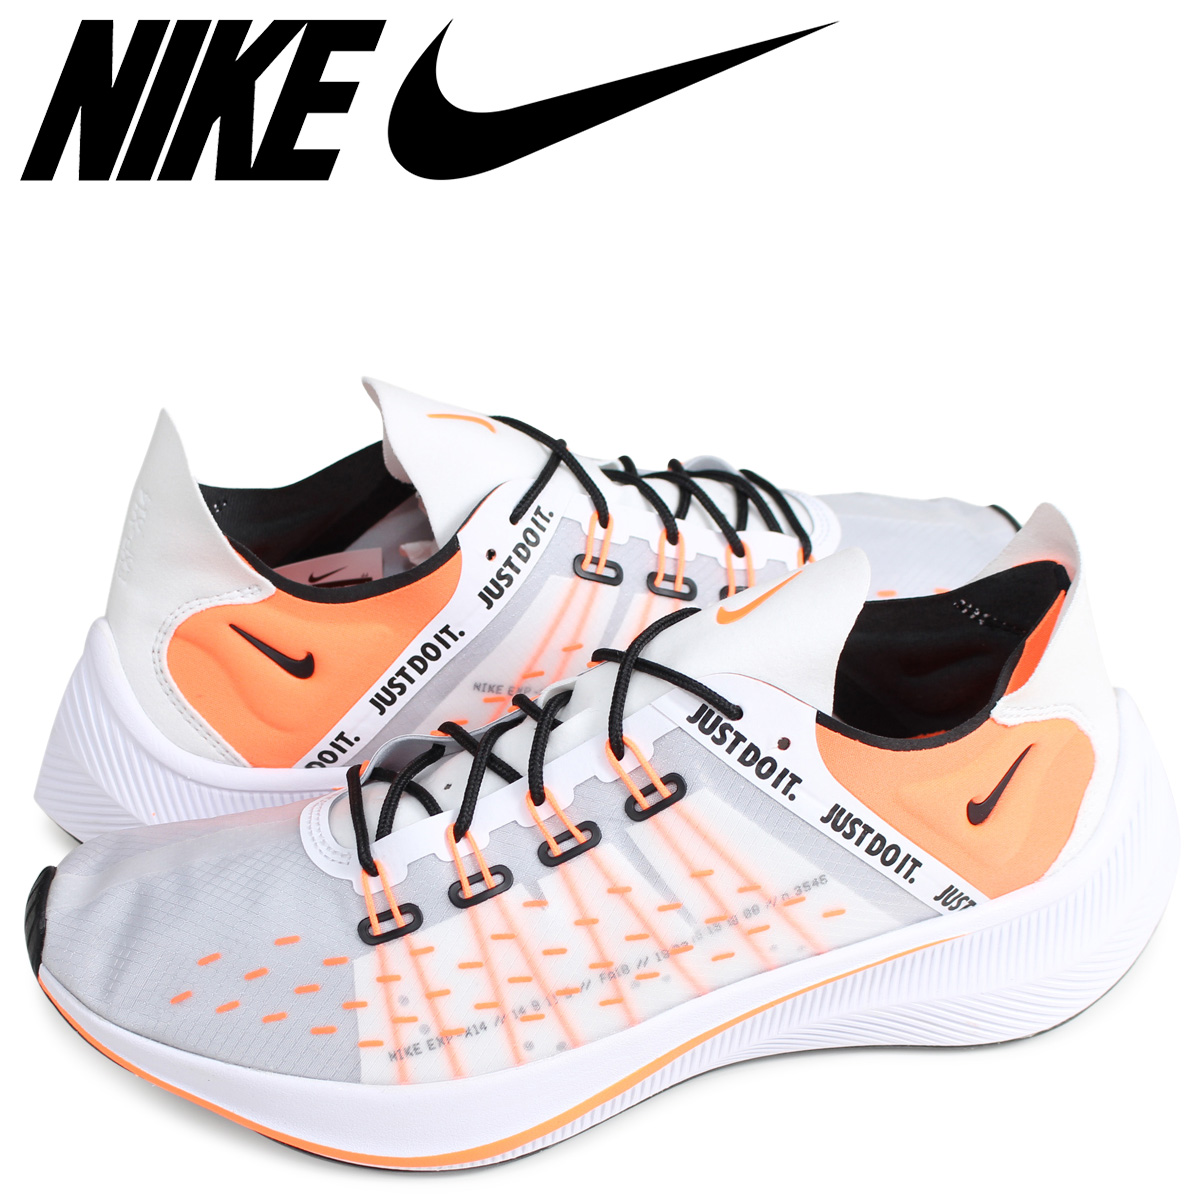 Acquista scarpa tennis nike OFF50% sconti